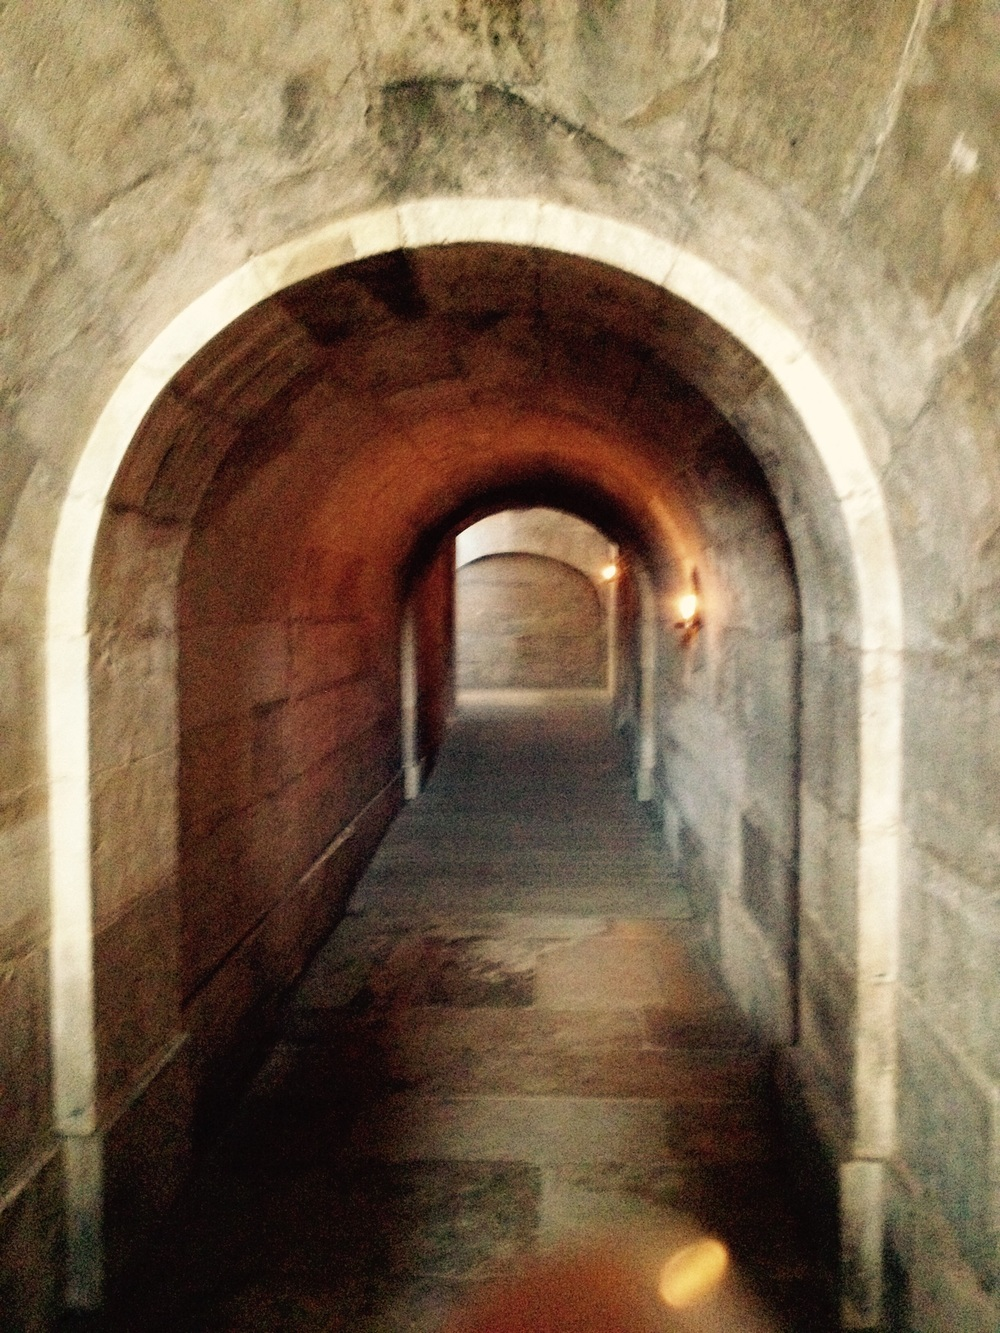 Hallway in the Petit Trianon